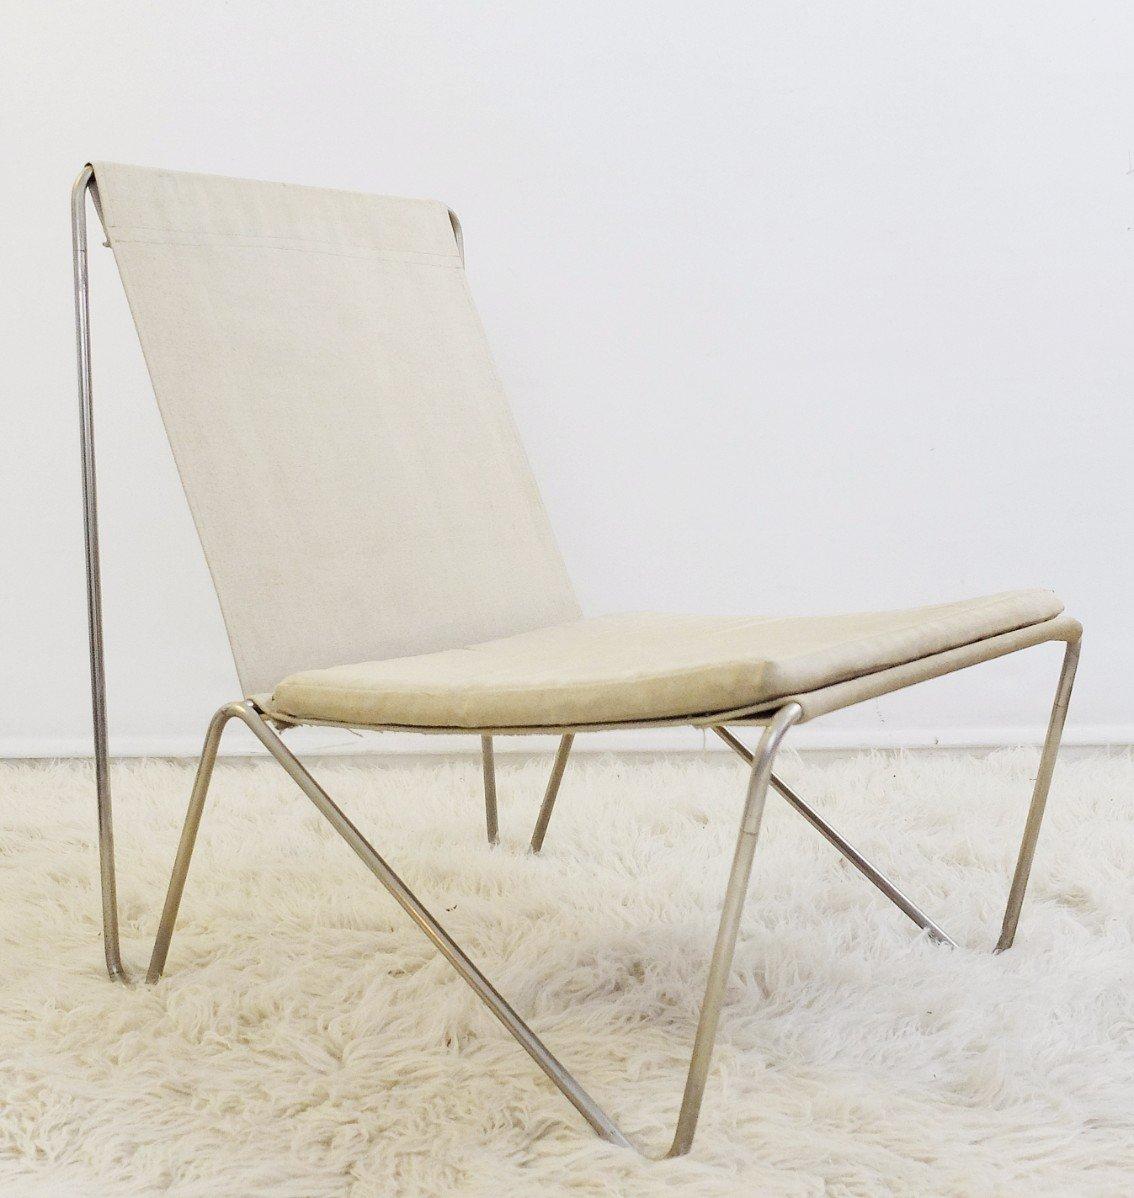 Bachelor stuhl von verner panton bei pamono kaufen for Design stuhl panton